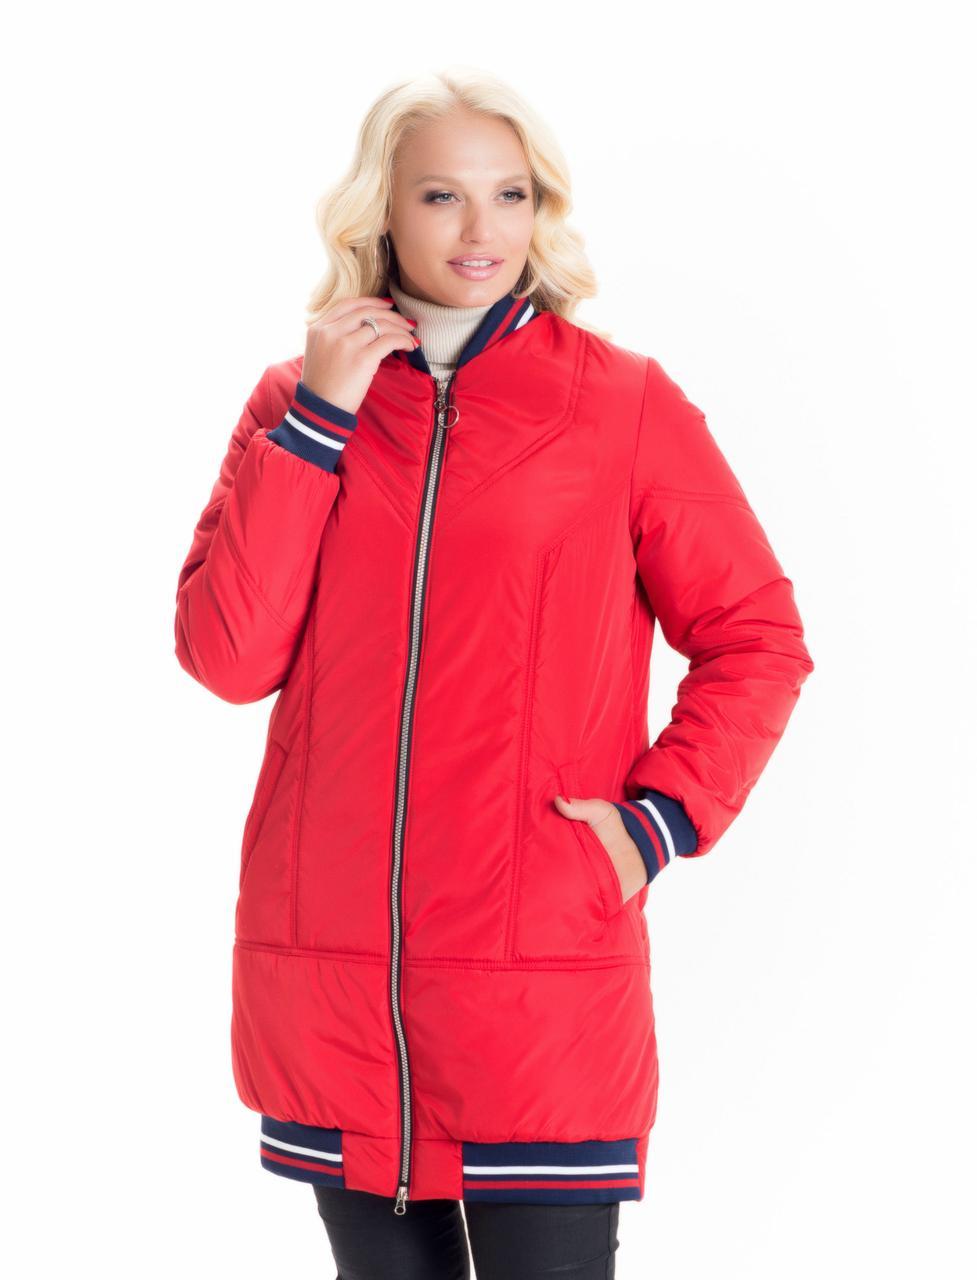 Модная красная весенняя куртка бомбер